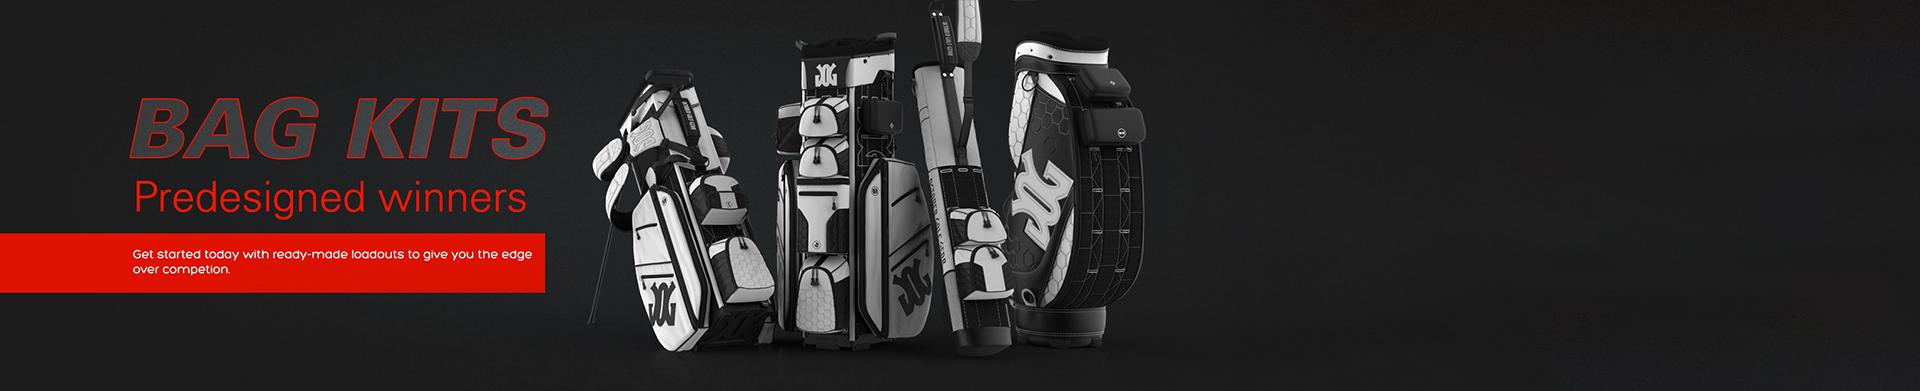 page-banner-bag-kits.jpg